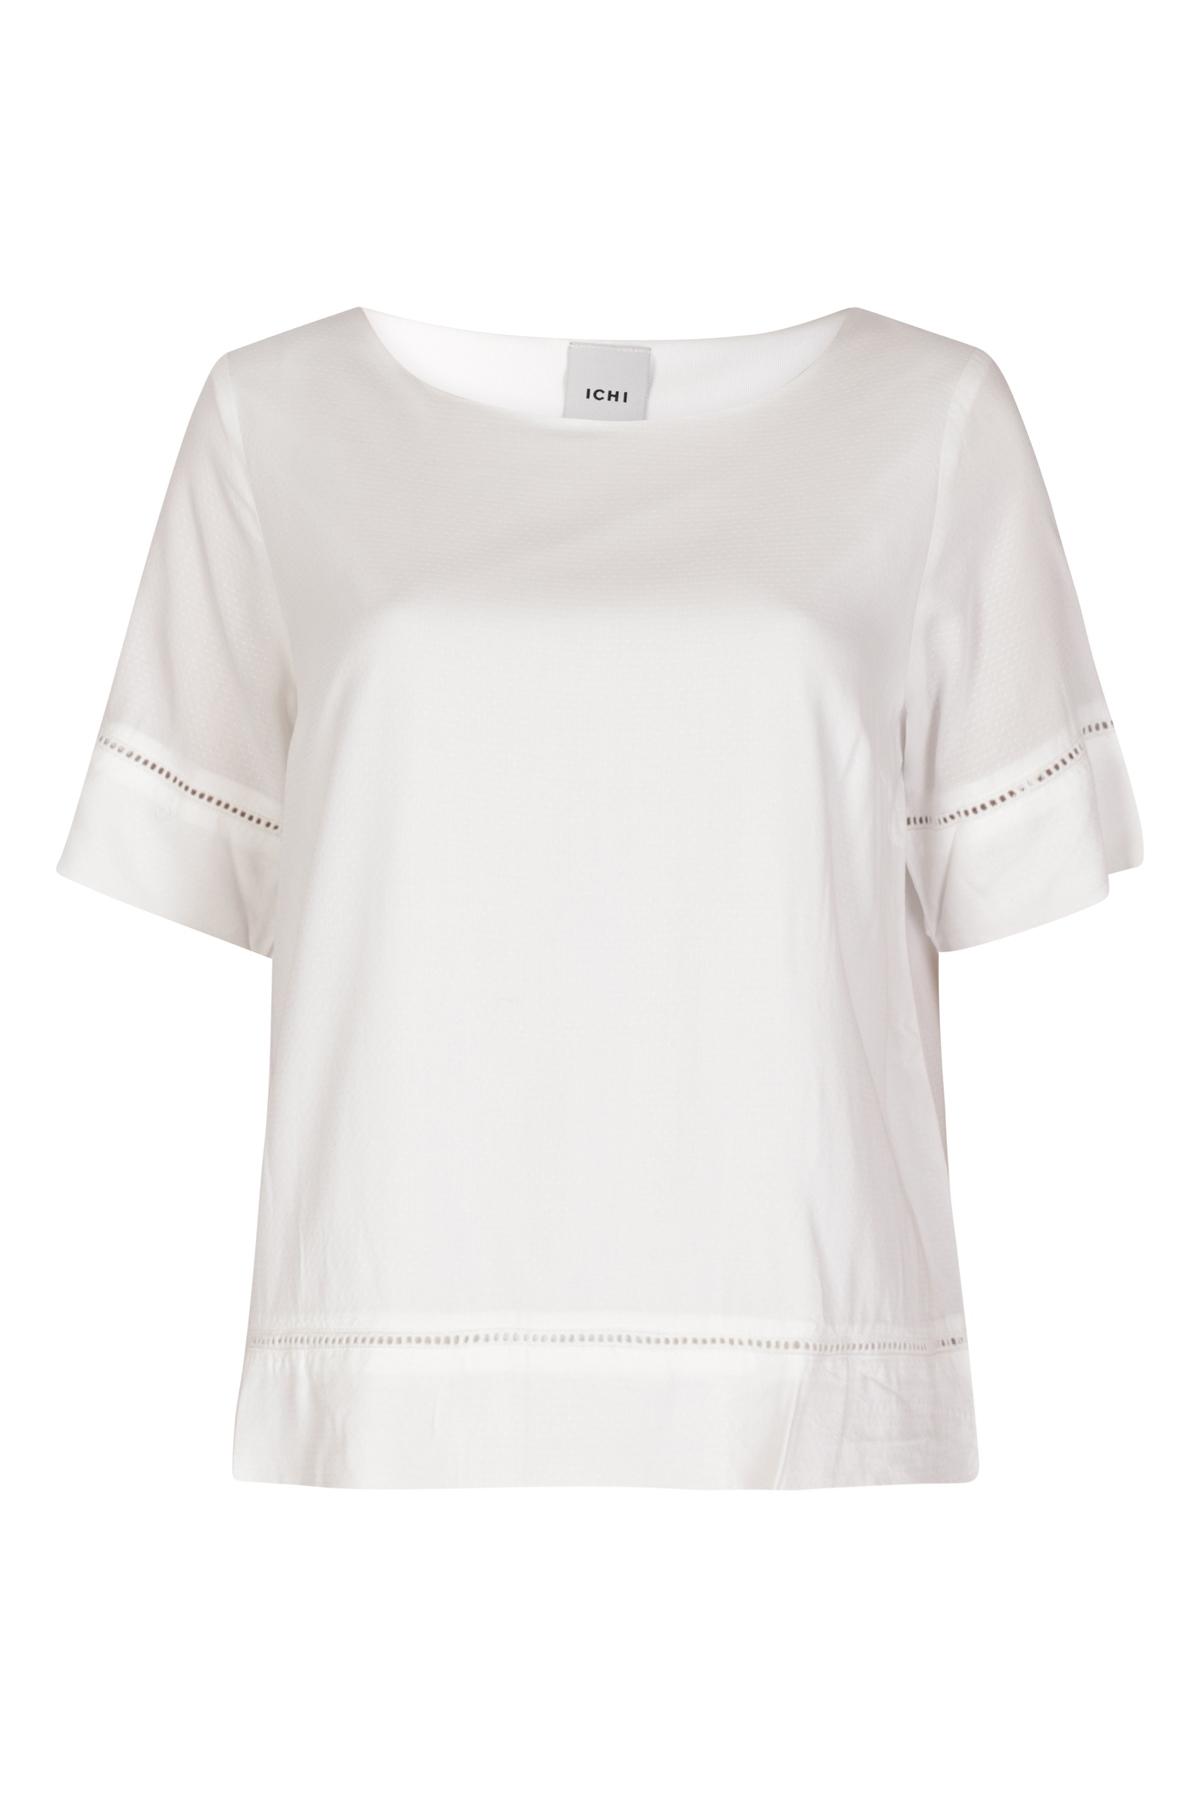 ICHI Shirt - Top Ecru Ihfernando SS